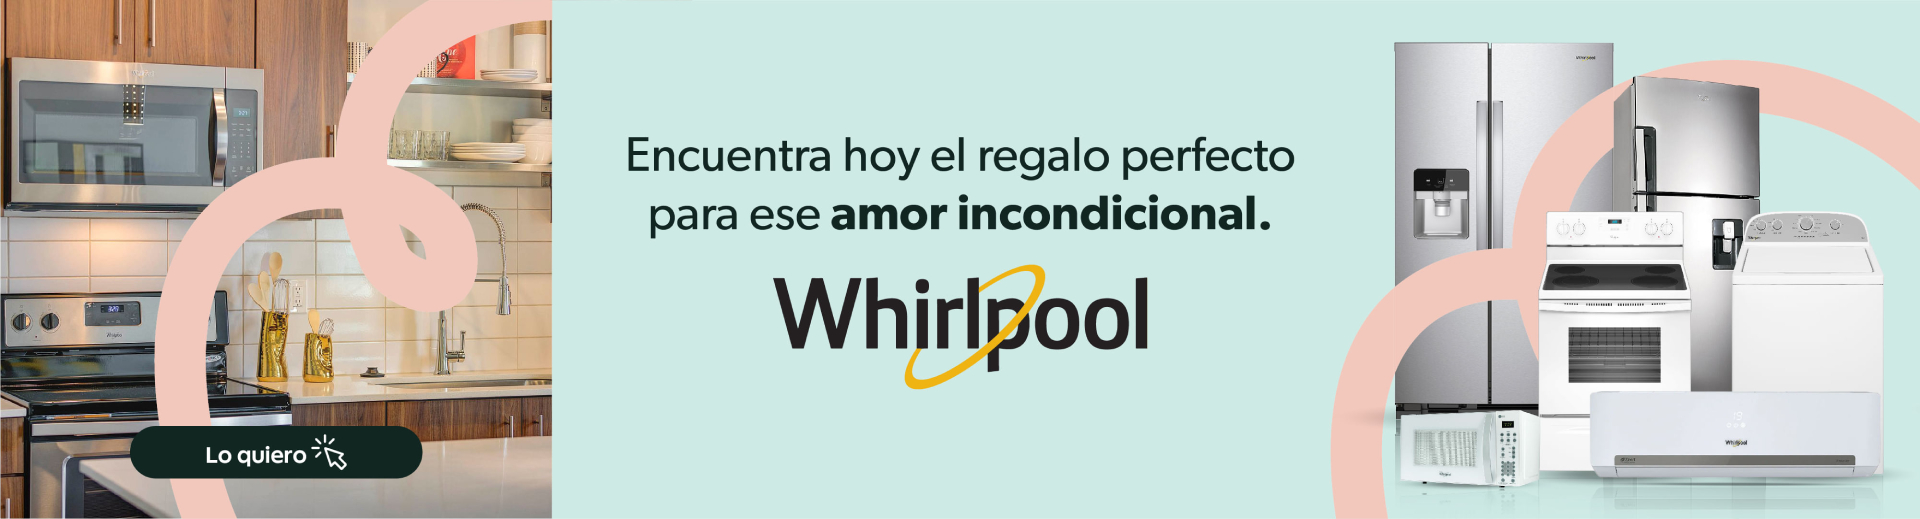 Banner Web Whirlpool Mamá al 9-5